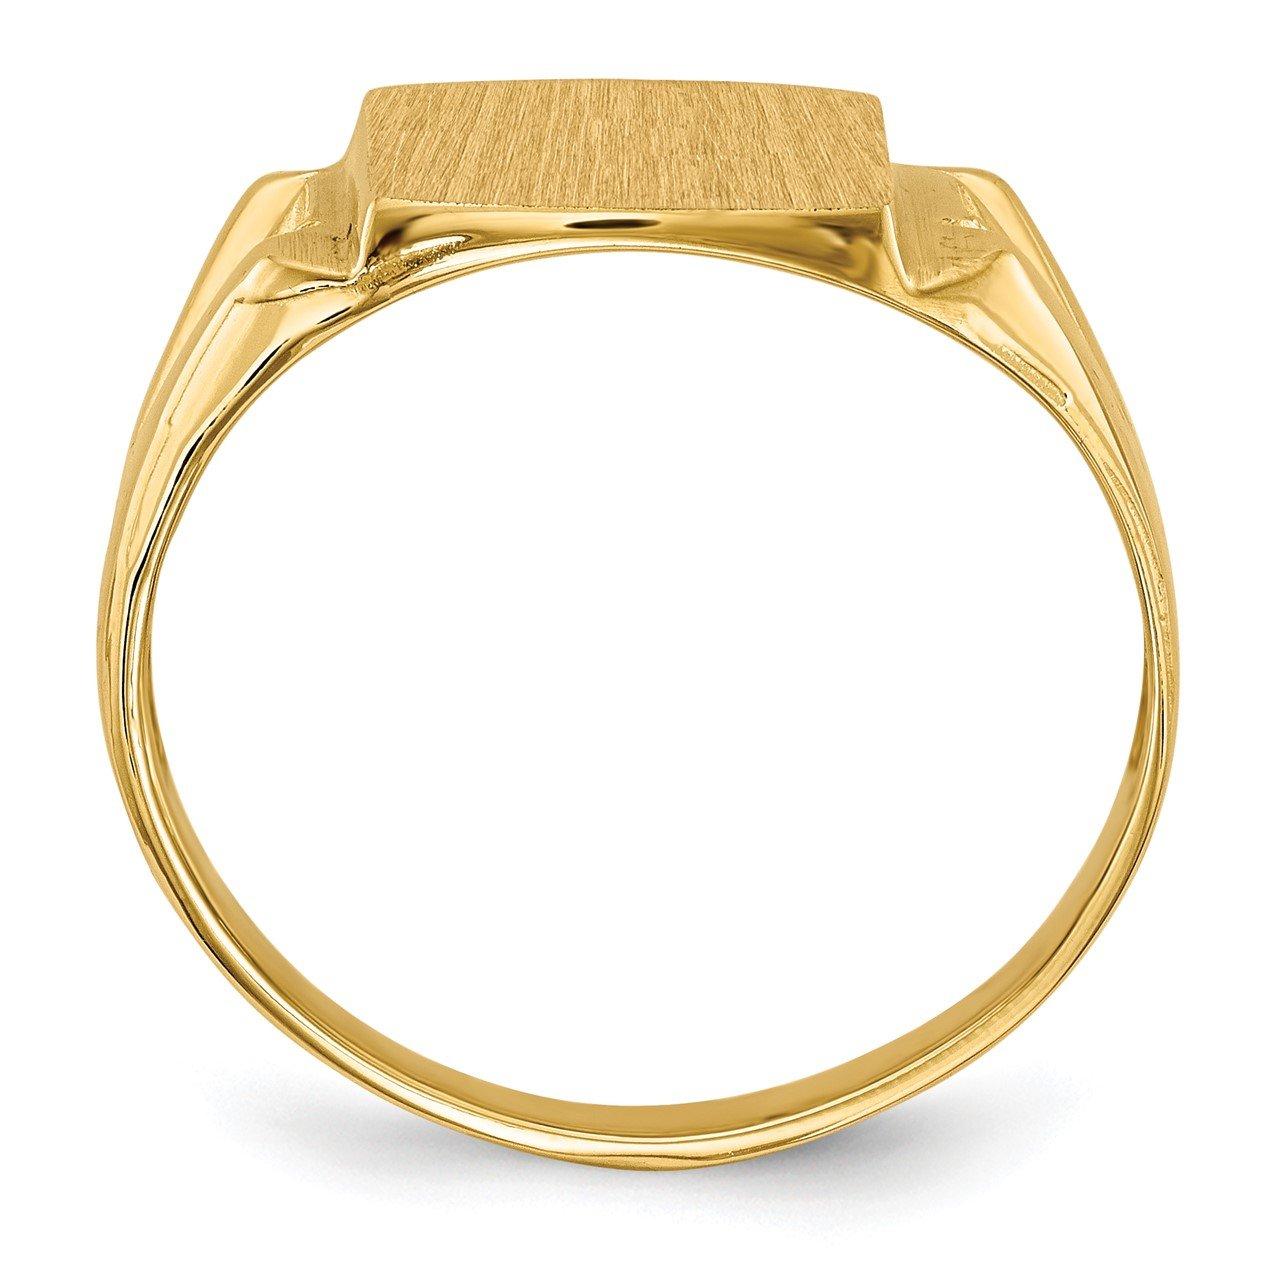 14k 12.0x11.0mm Open Back AA Diamond Men's Signet Ring-1